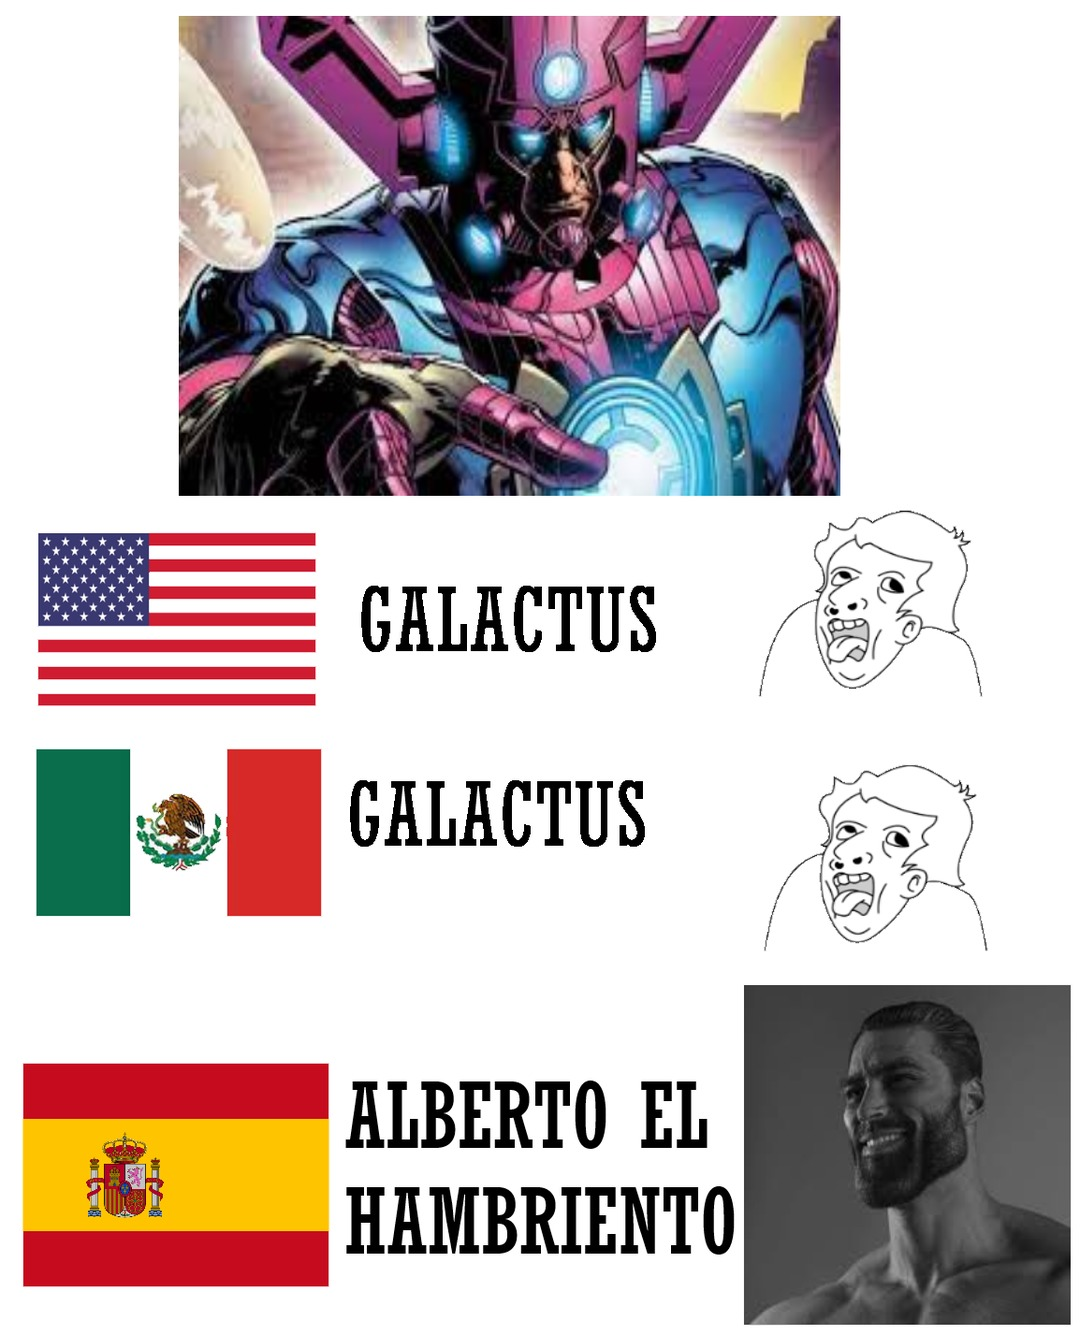 alberto - meme